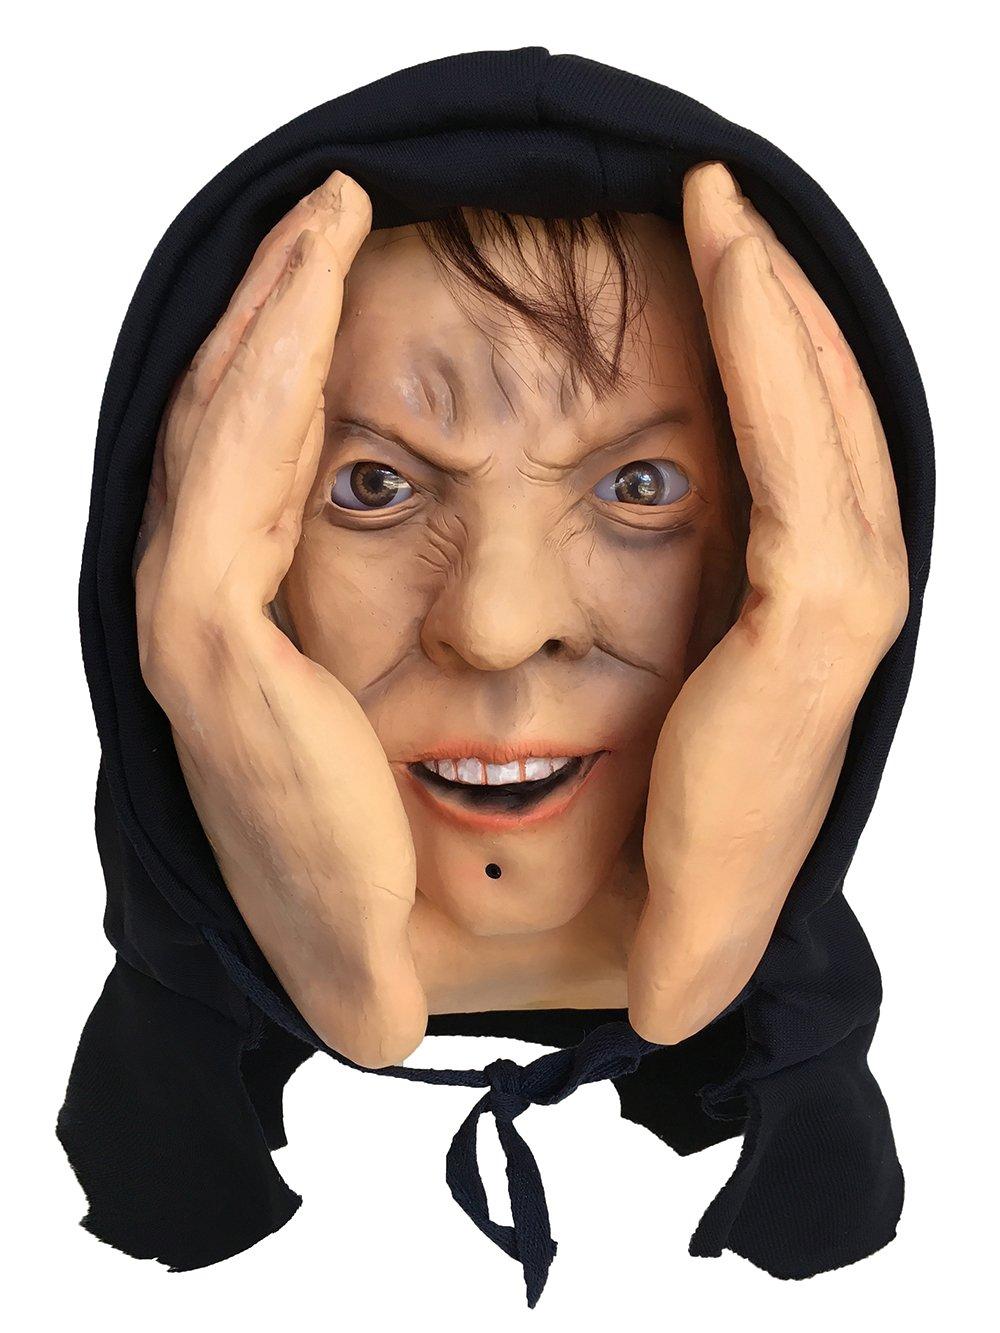 Motion Sensor Animated Eyes Scary Peeper Creeper Window Prop - Halloween Haunted House Prank Decoration Display Window Cling